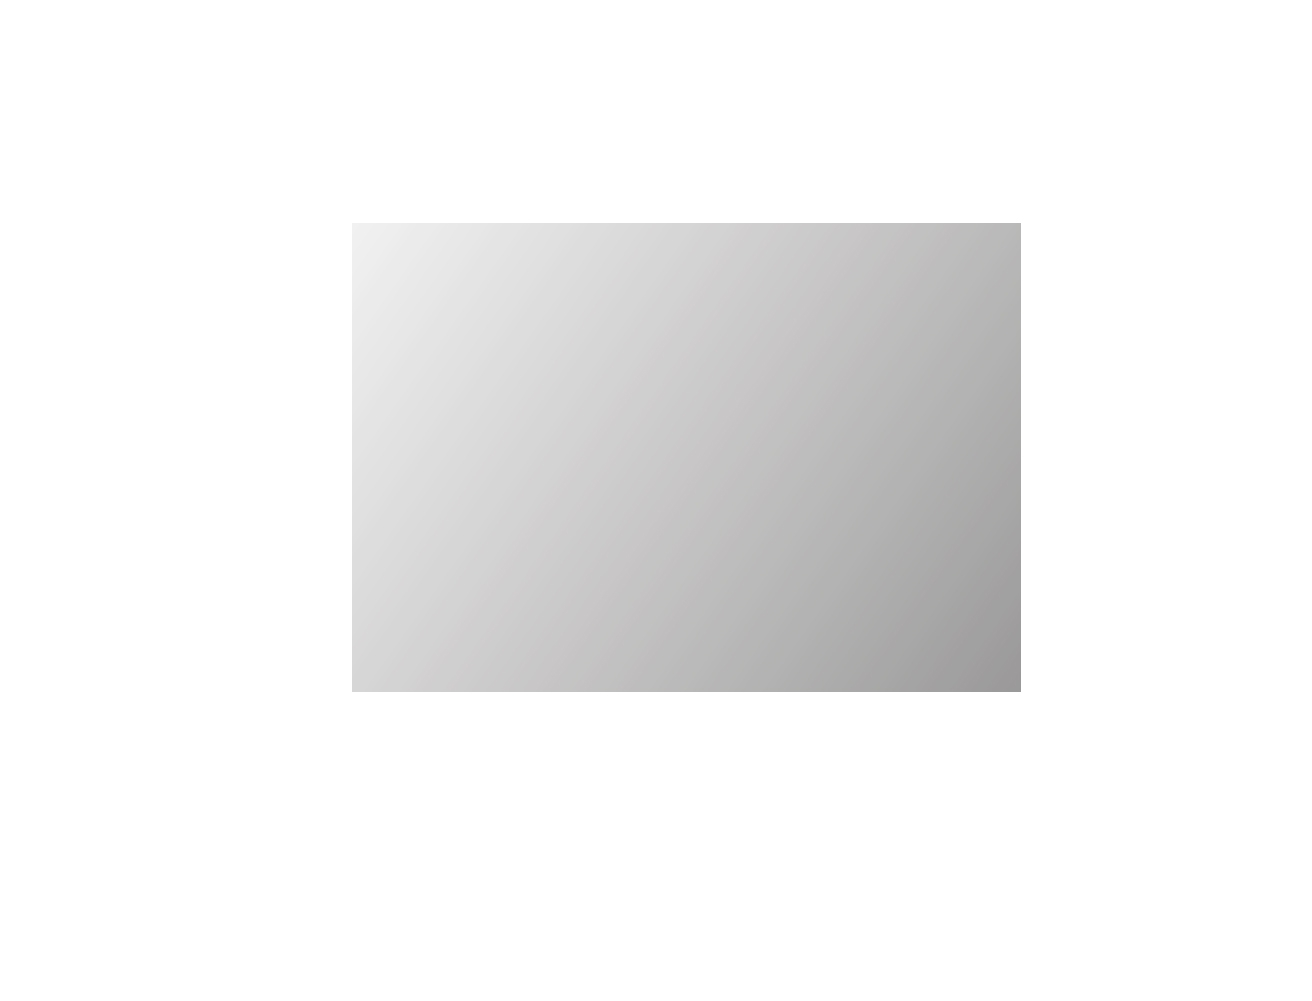 Proline Basic spiegel rechthoek op alu frame 80cm - xmm (bxd)